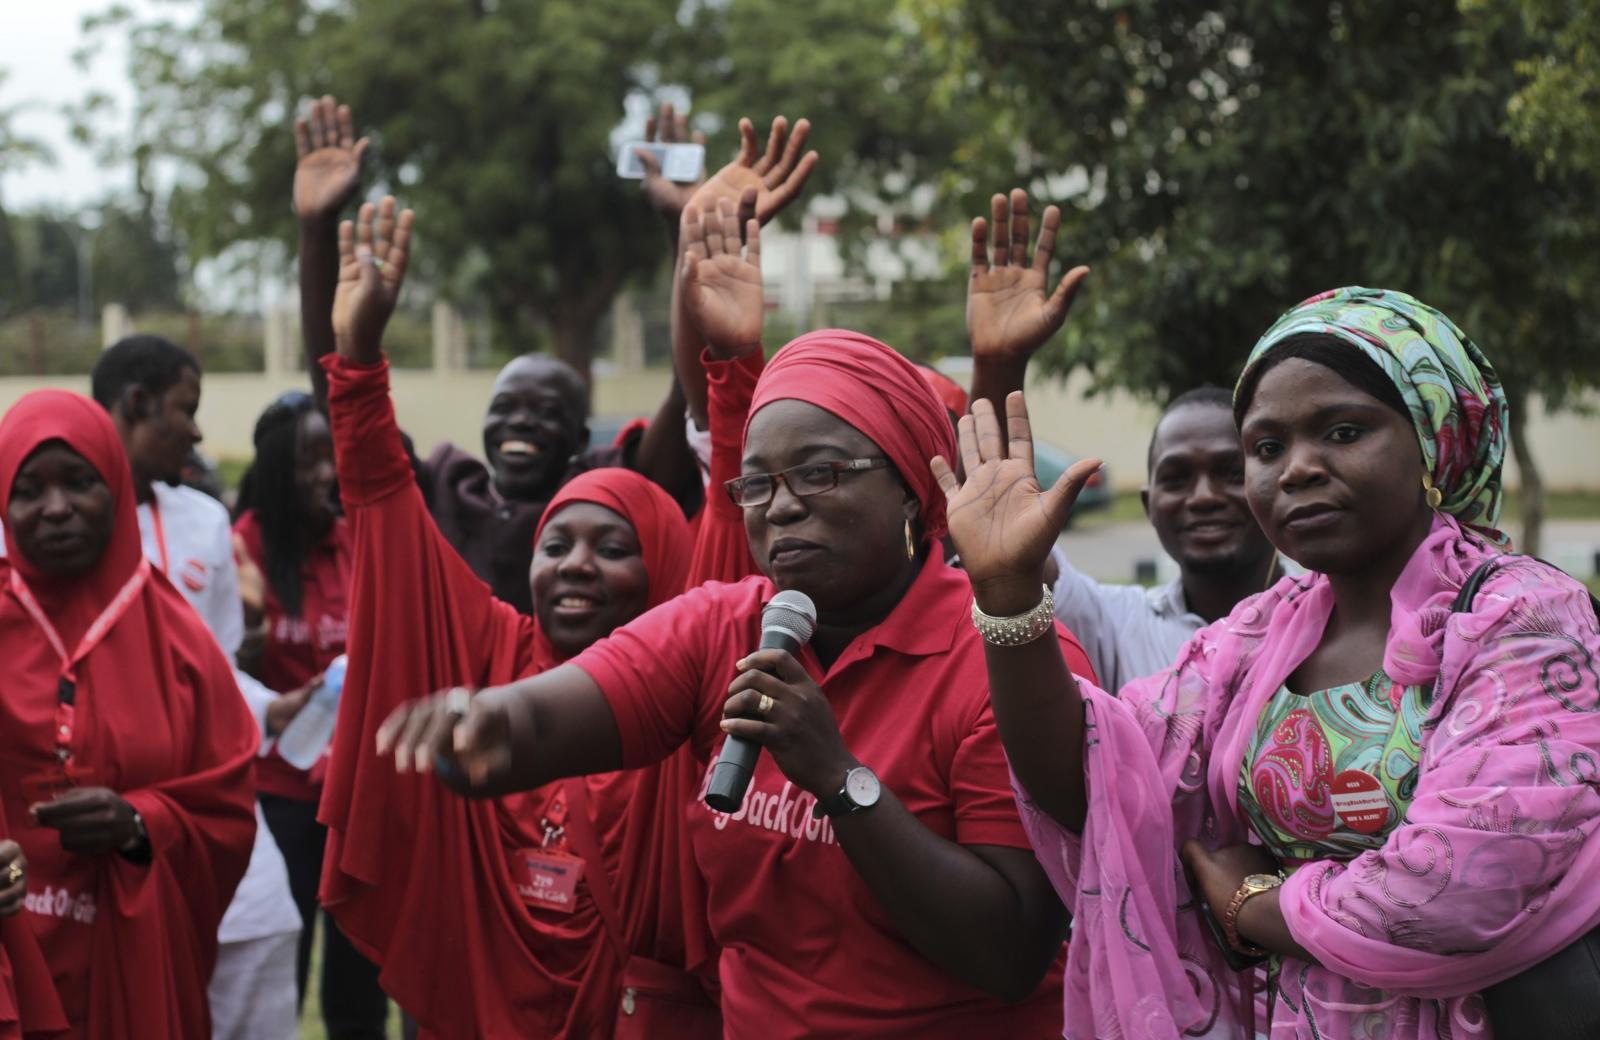 #Bring Back Our Girls Boko Haram Nigeria